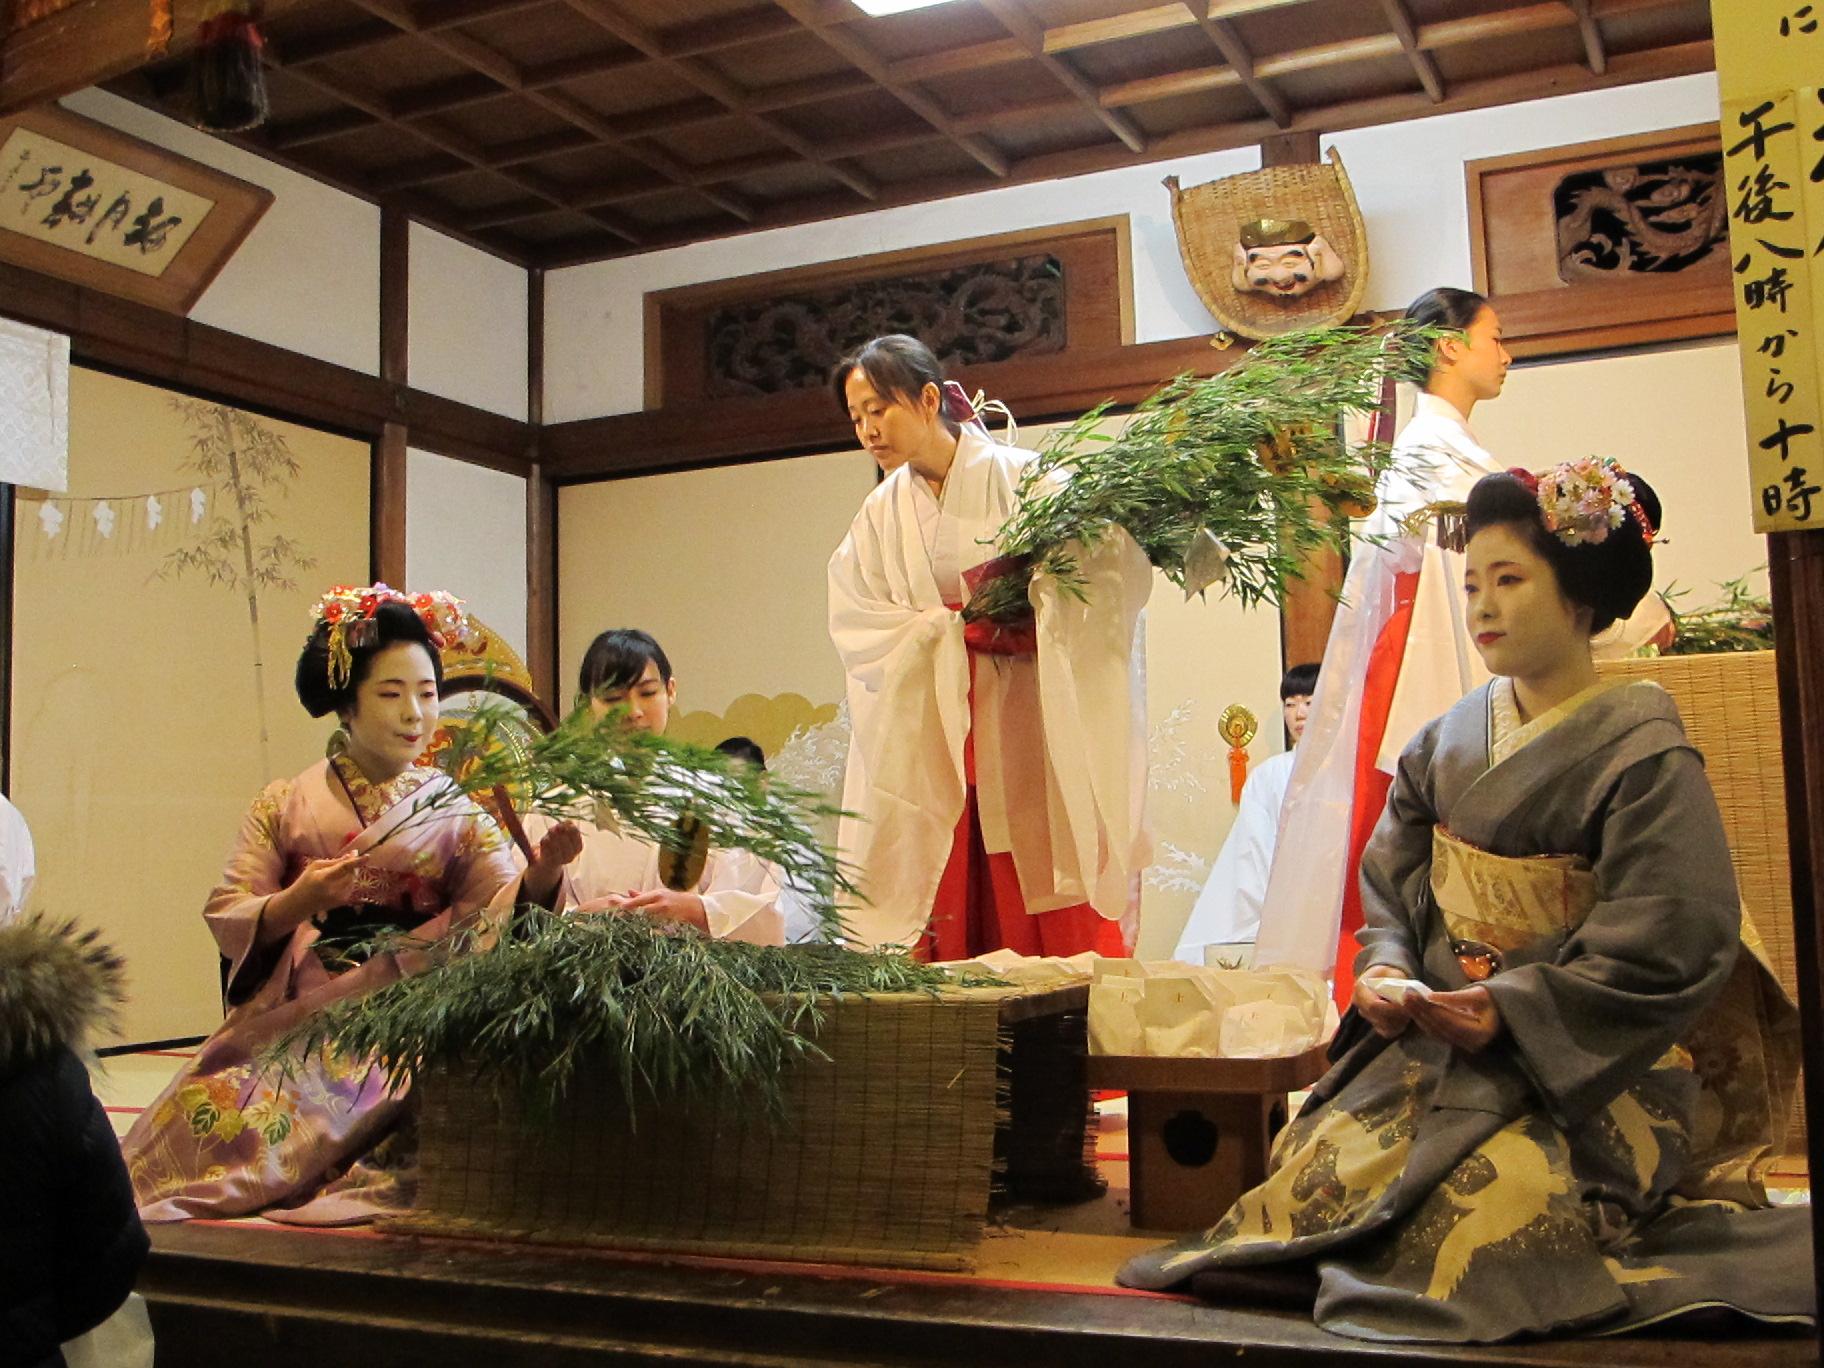 #20 Maiko from the Miyagawa district